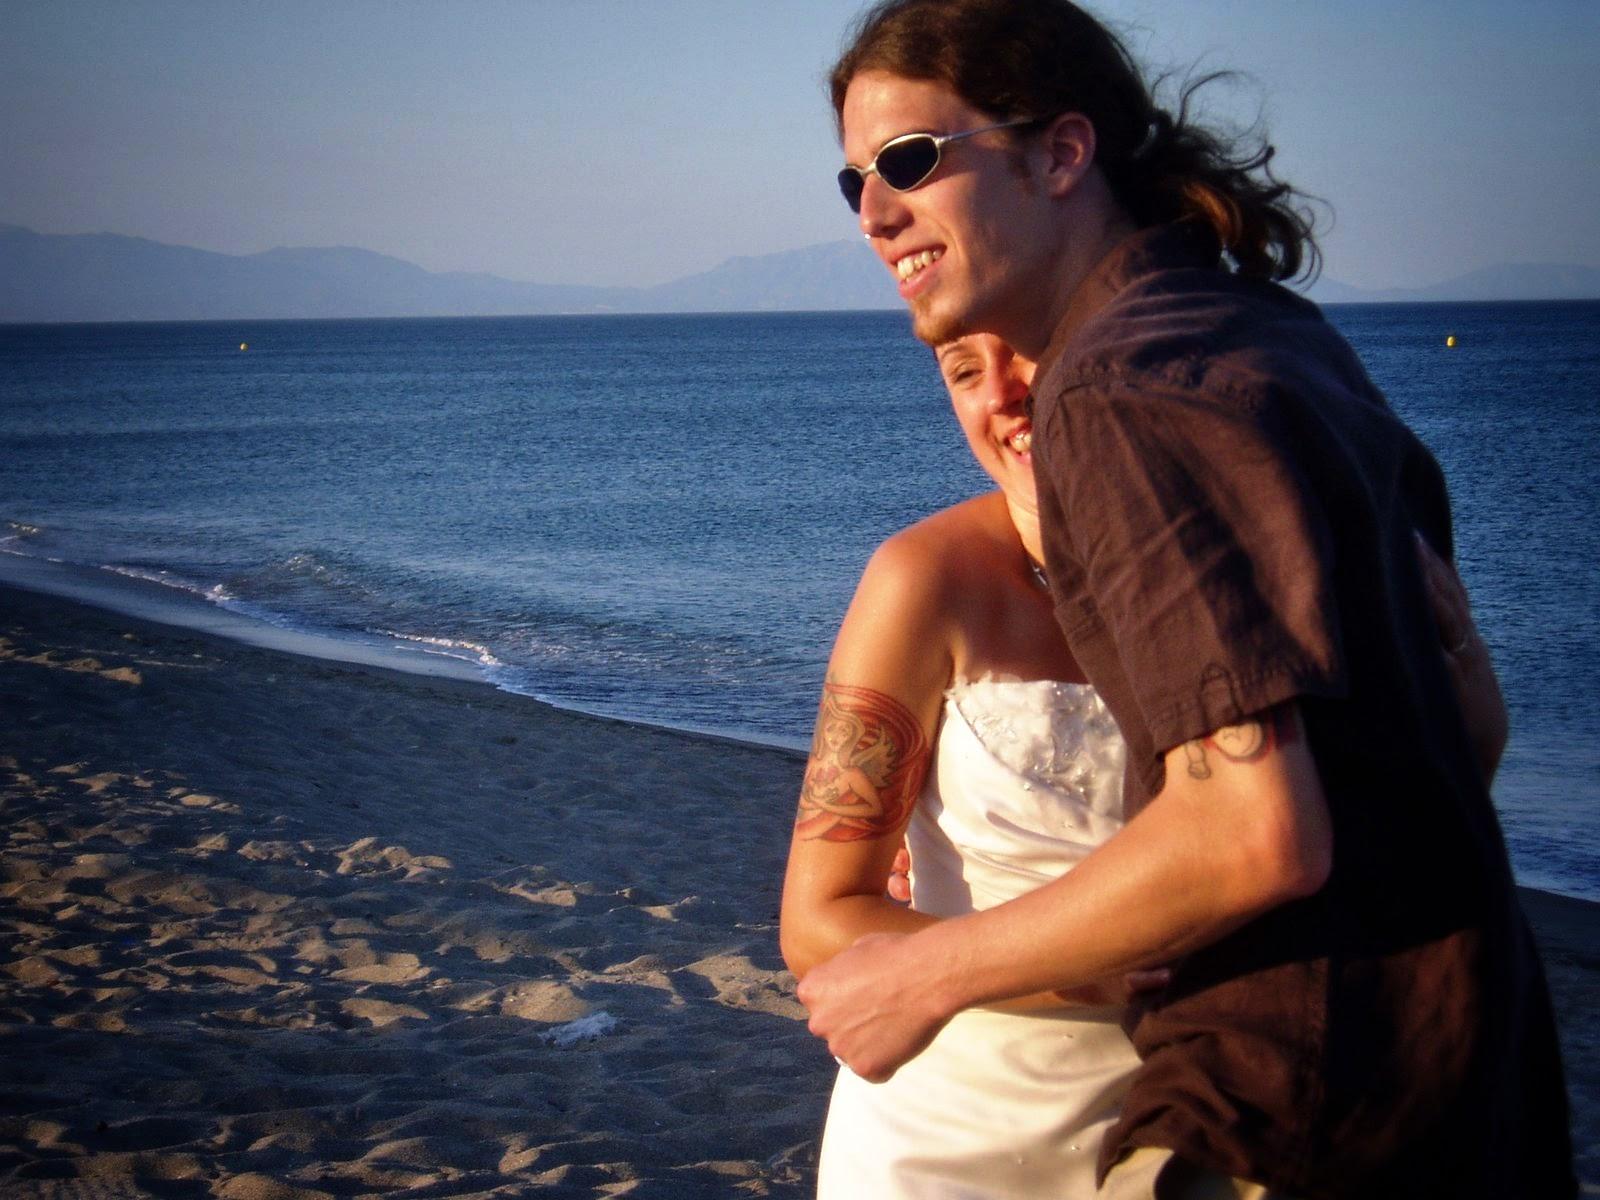 Wedding photos on the Estepona Beach